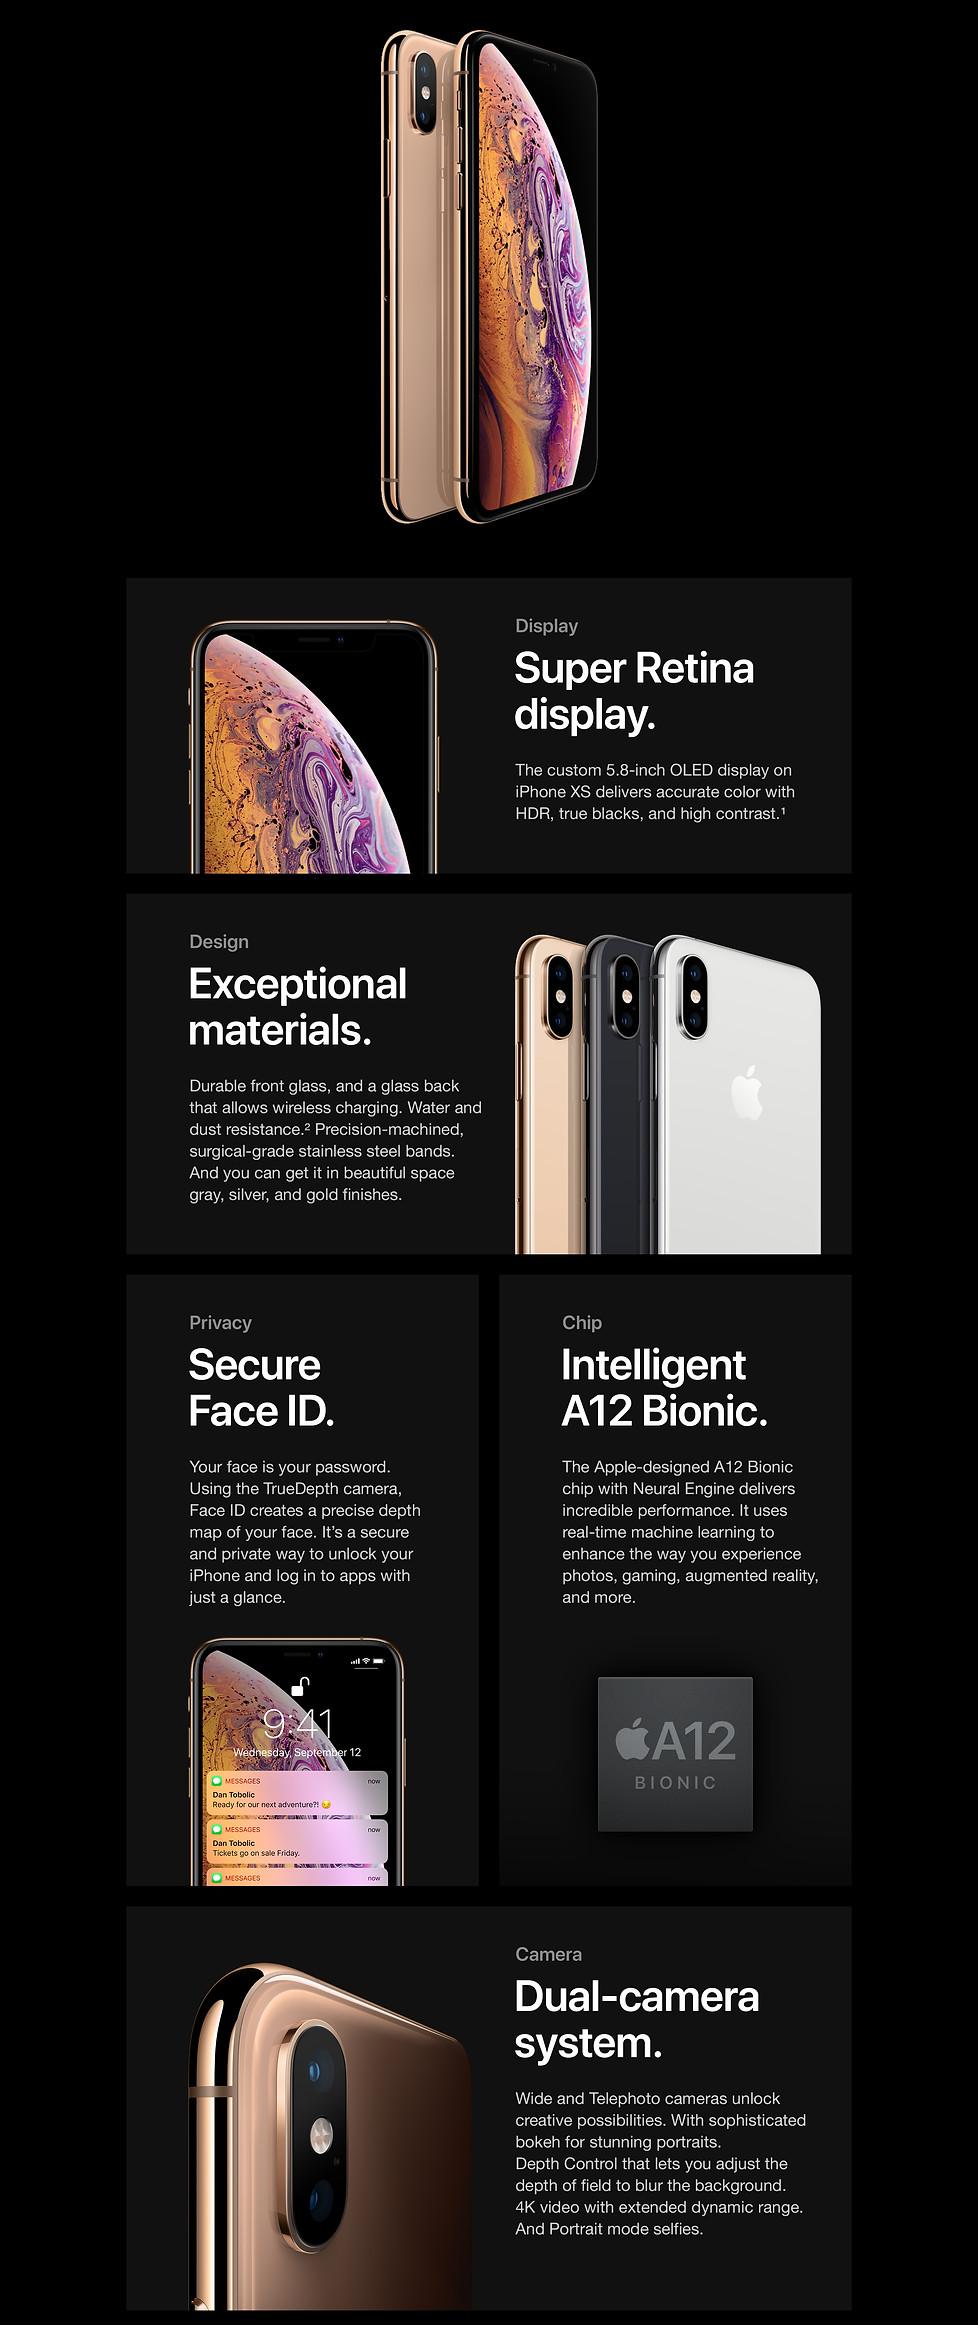 ROSA_iPhoneXS-MarketingPage-L_AVAIL_FA_L